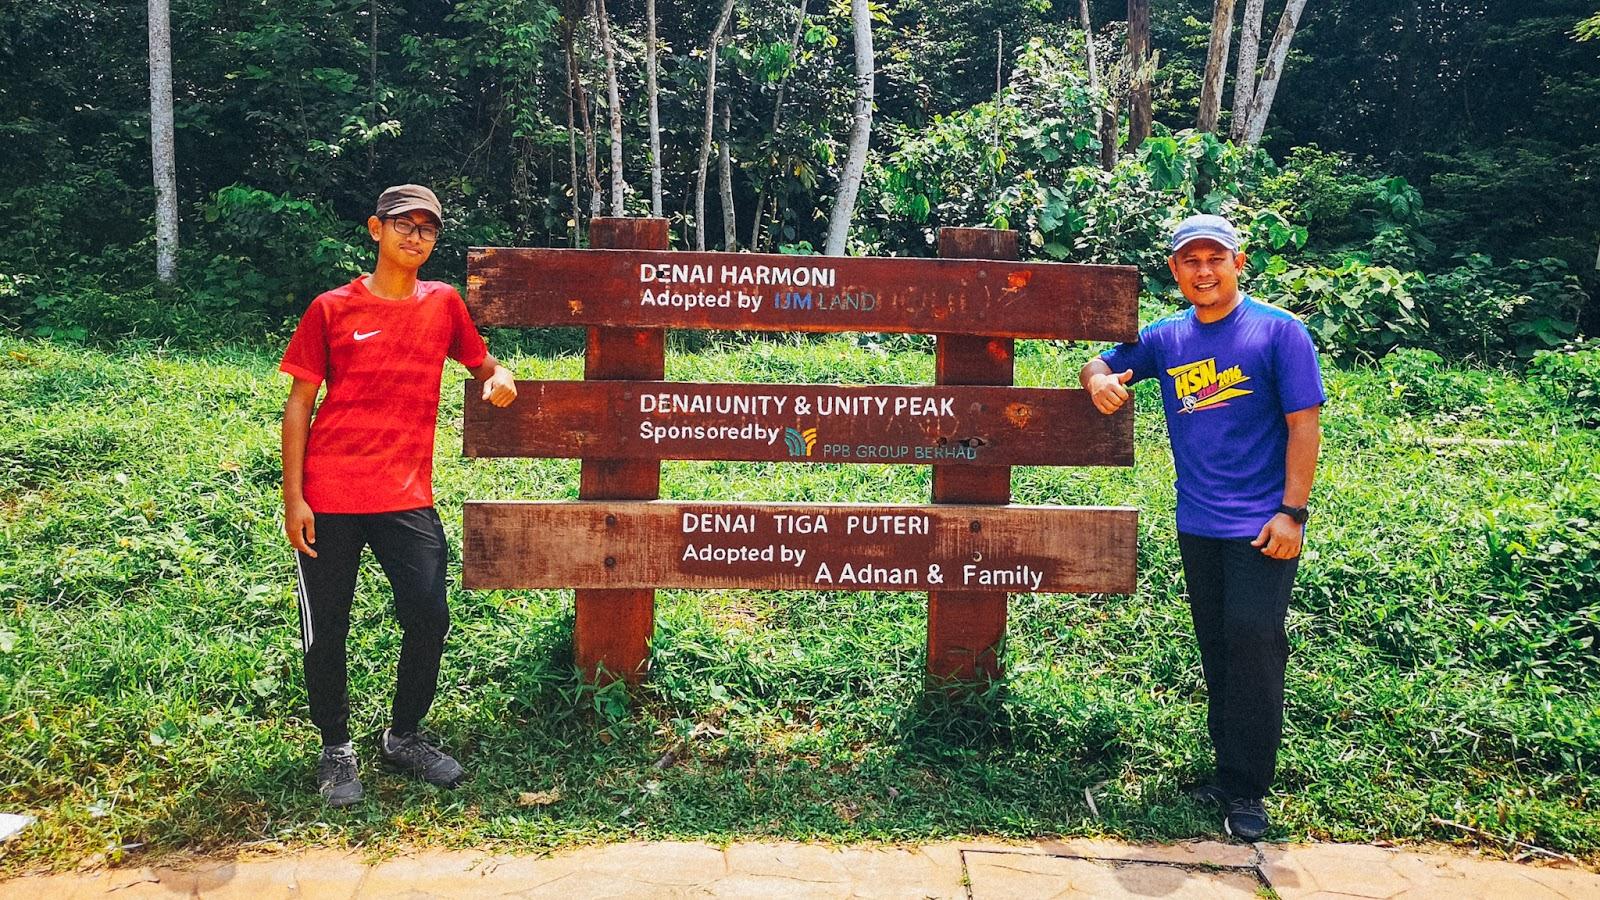 Kota Damansara Community Forest (KDCF)